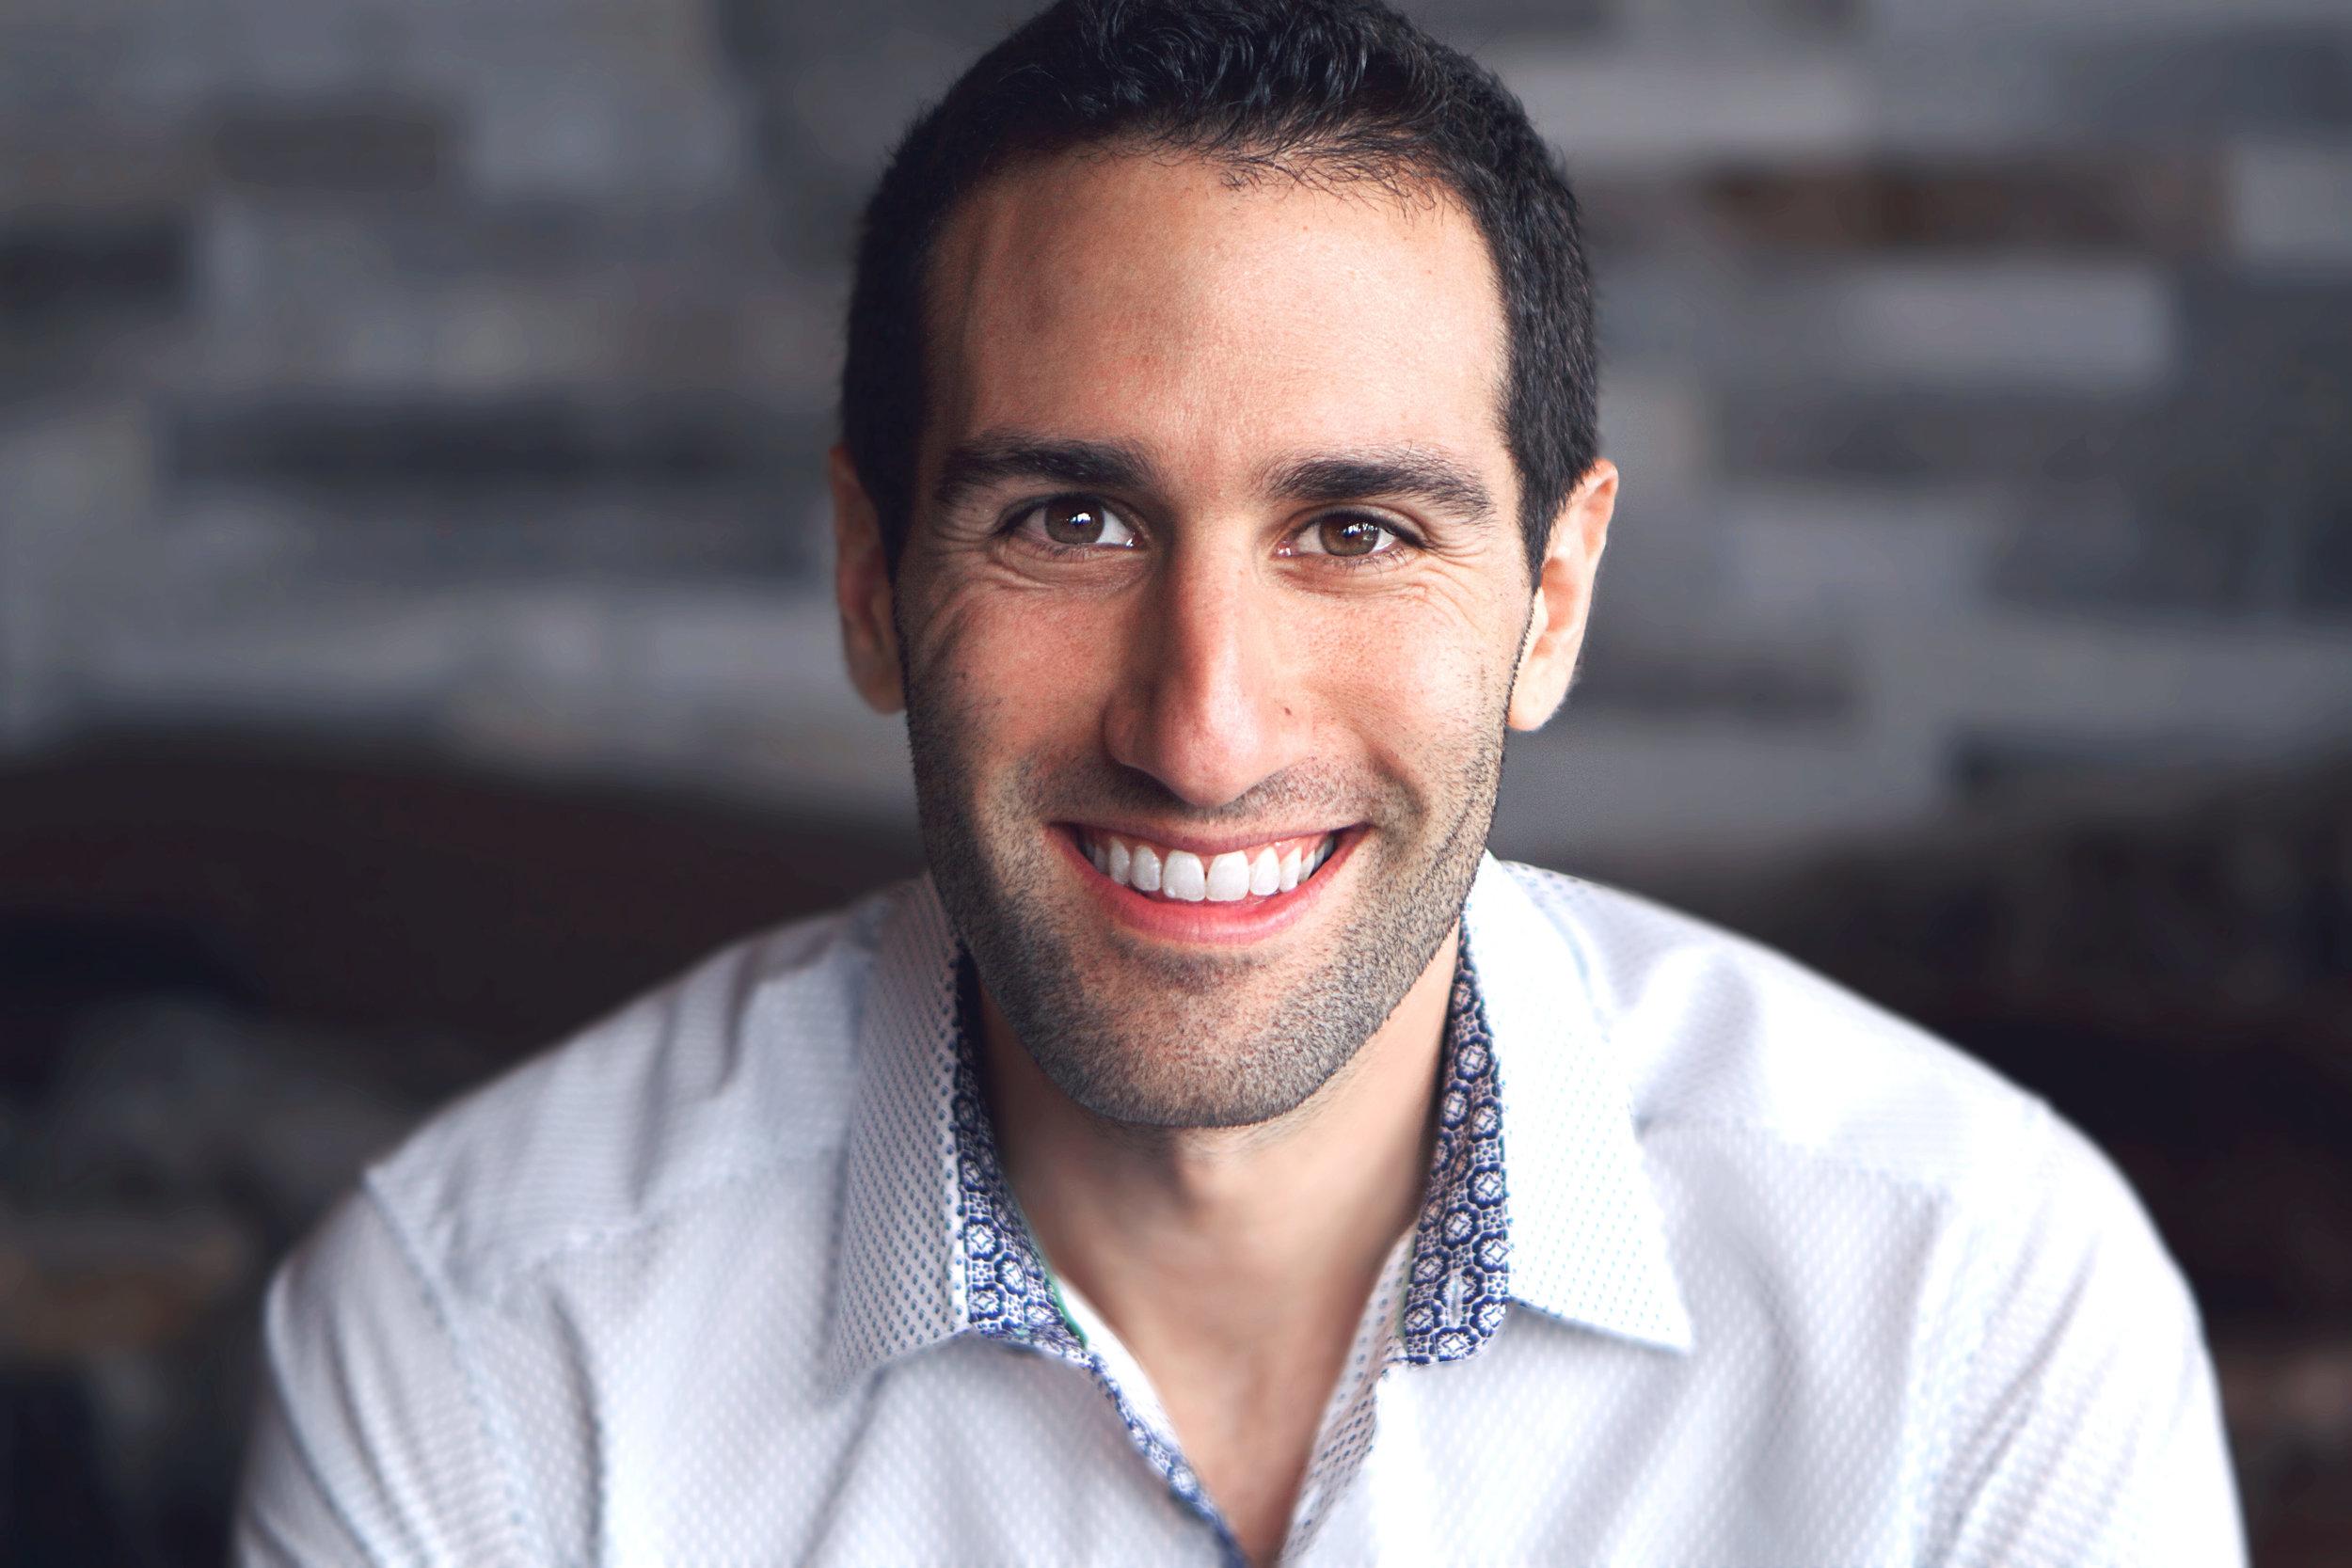 Brian Schwartz, Vice President, Global Partner Marketing Expedia Inc.